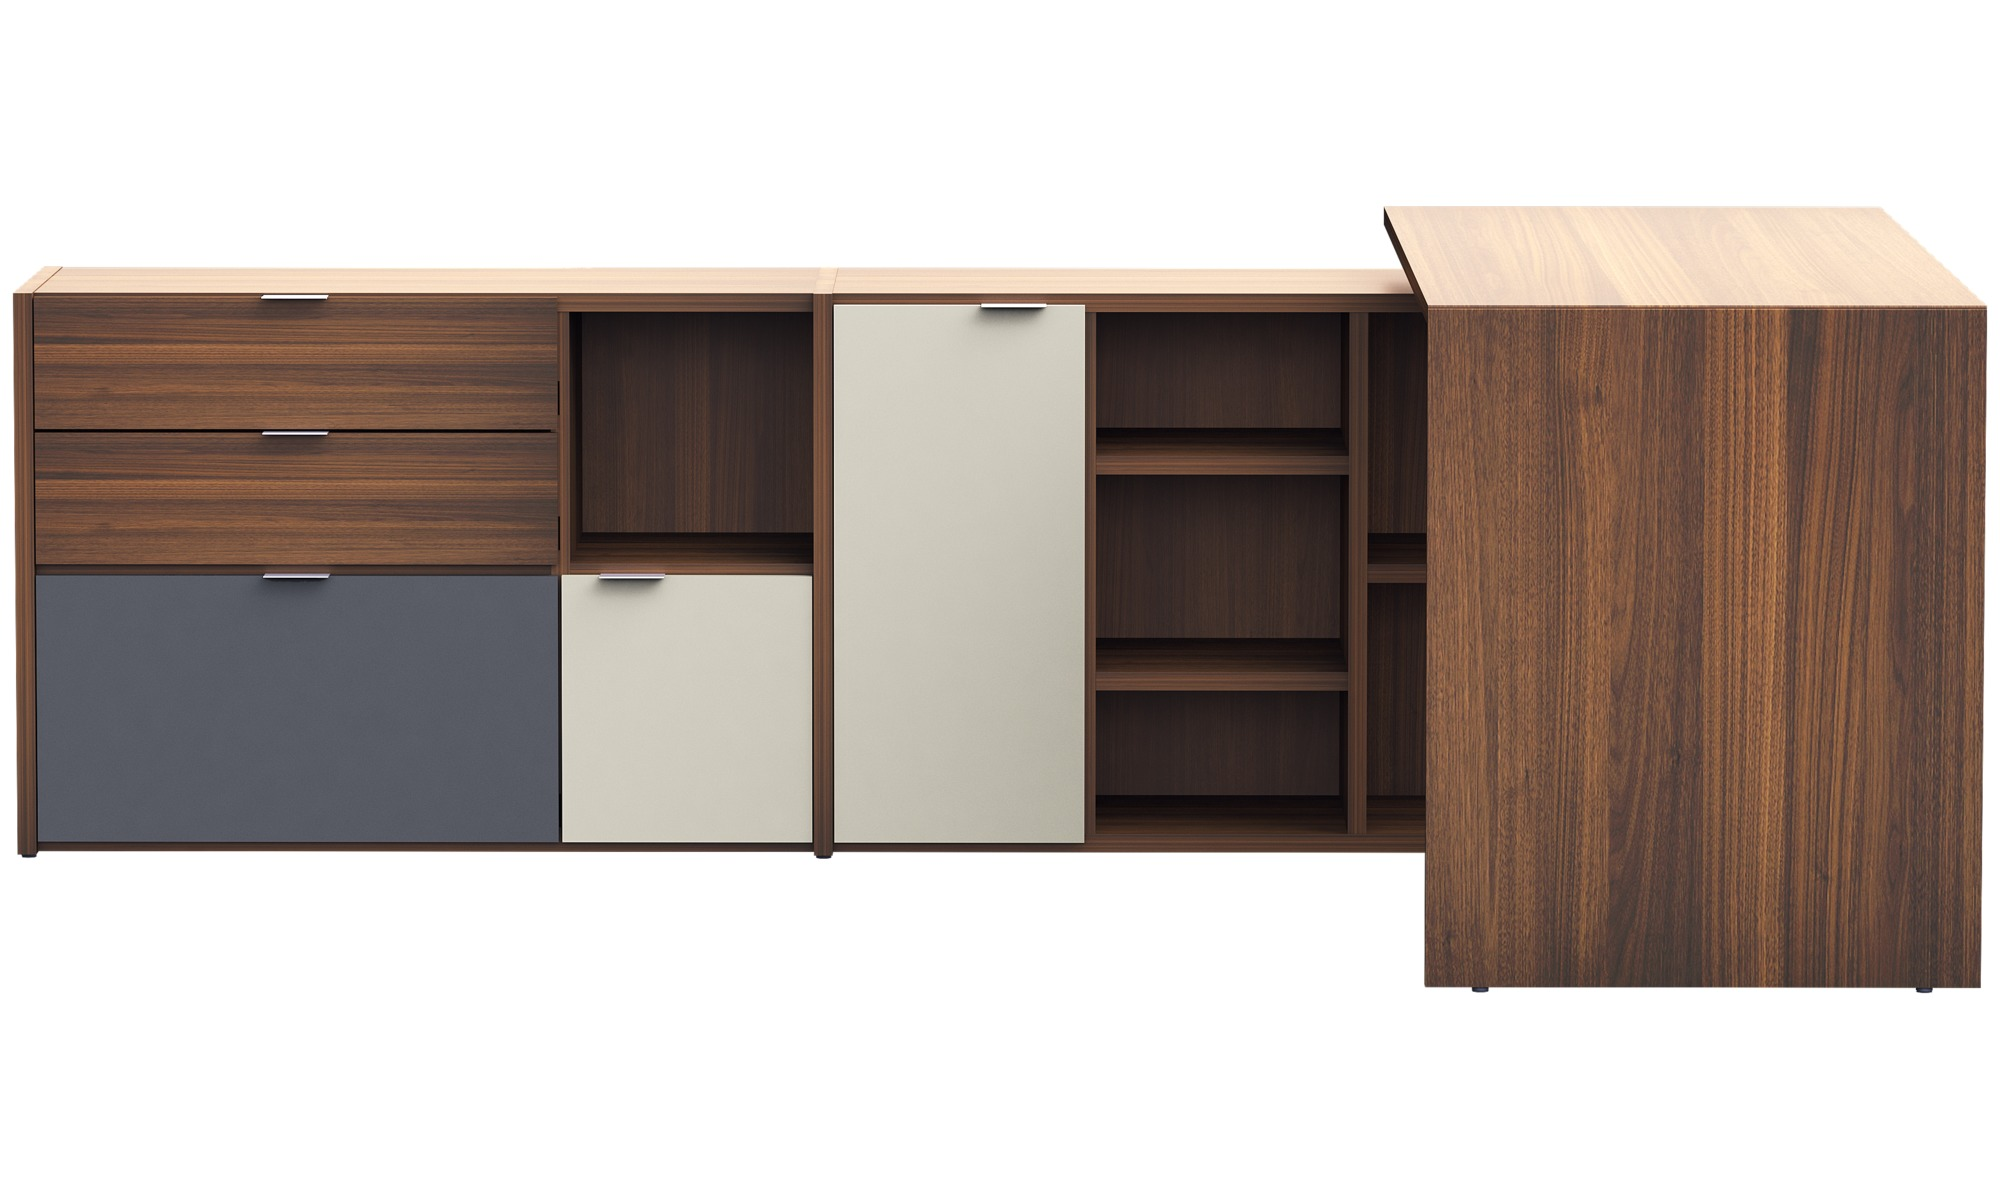 Desks - Copenhagen office system - Brown - Walnut